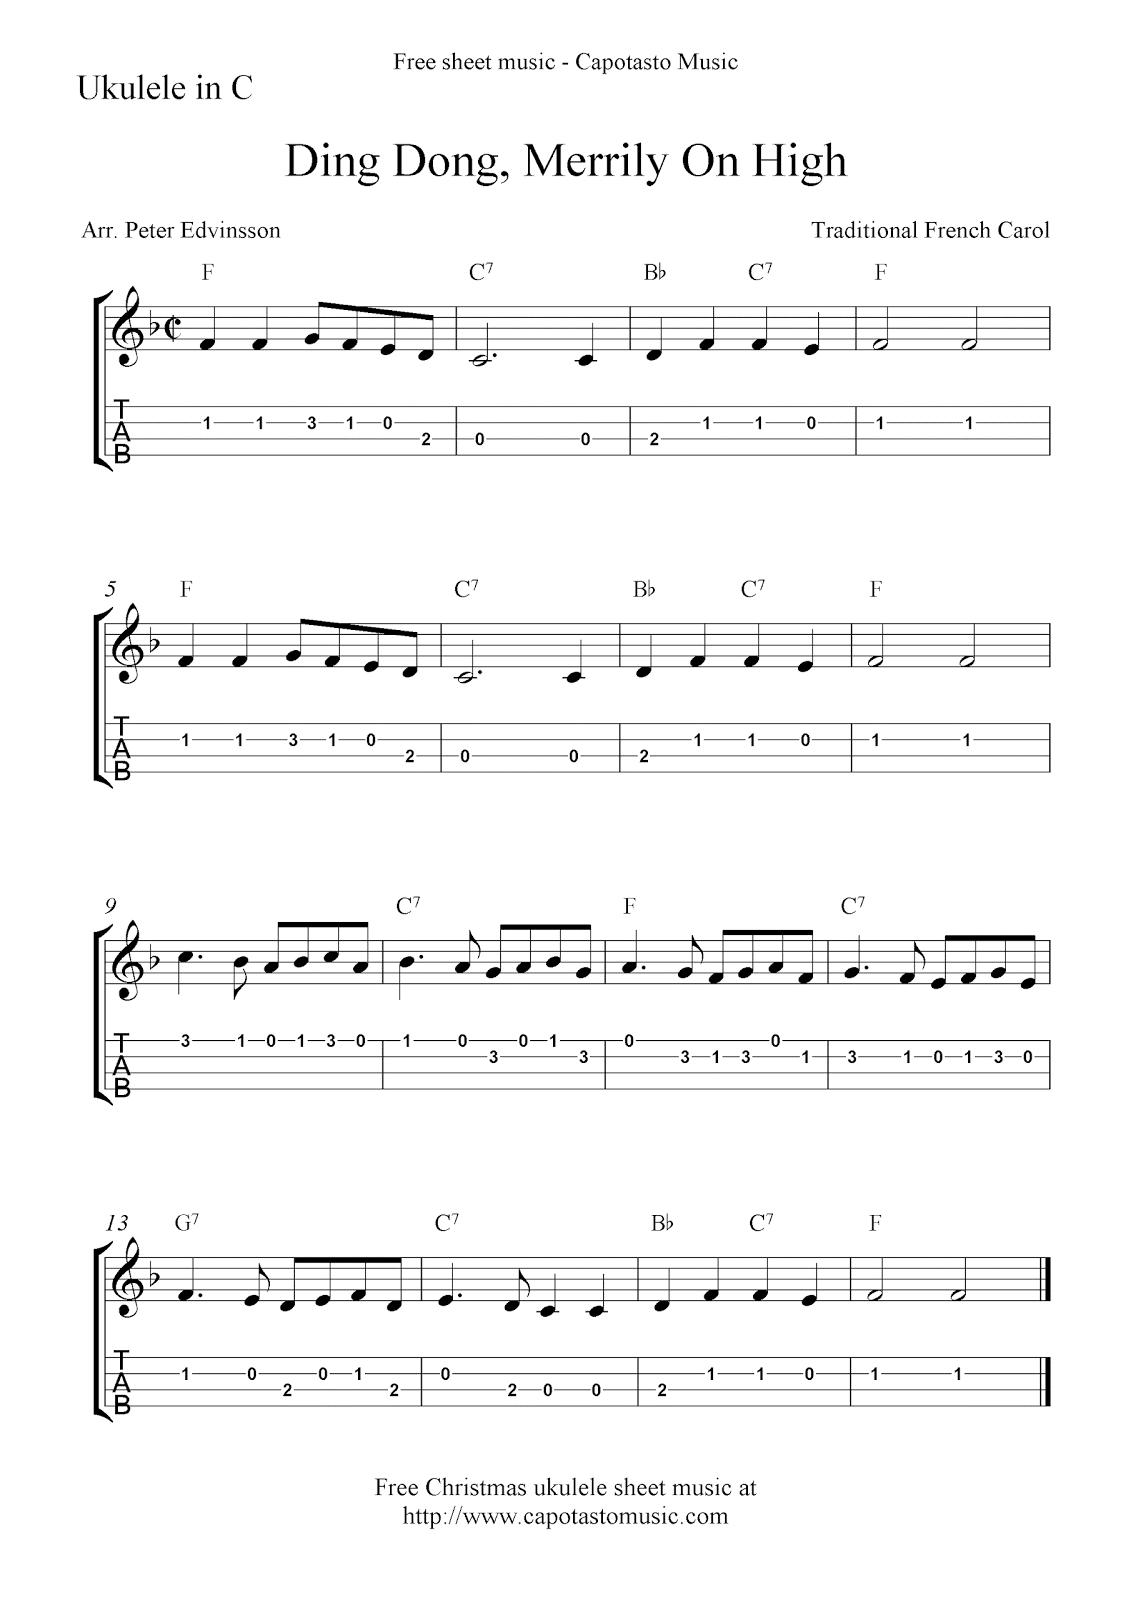 Ding Dong, Merrily On High, free Christmas ukulele tab sheet music